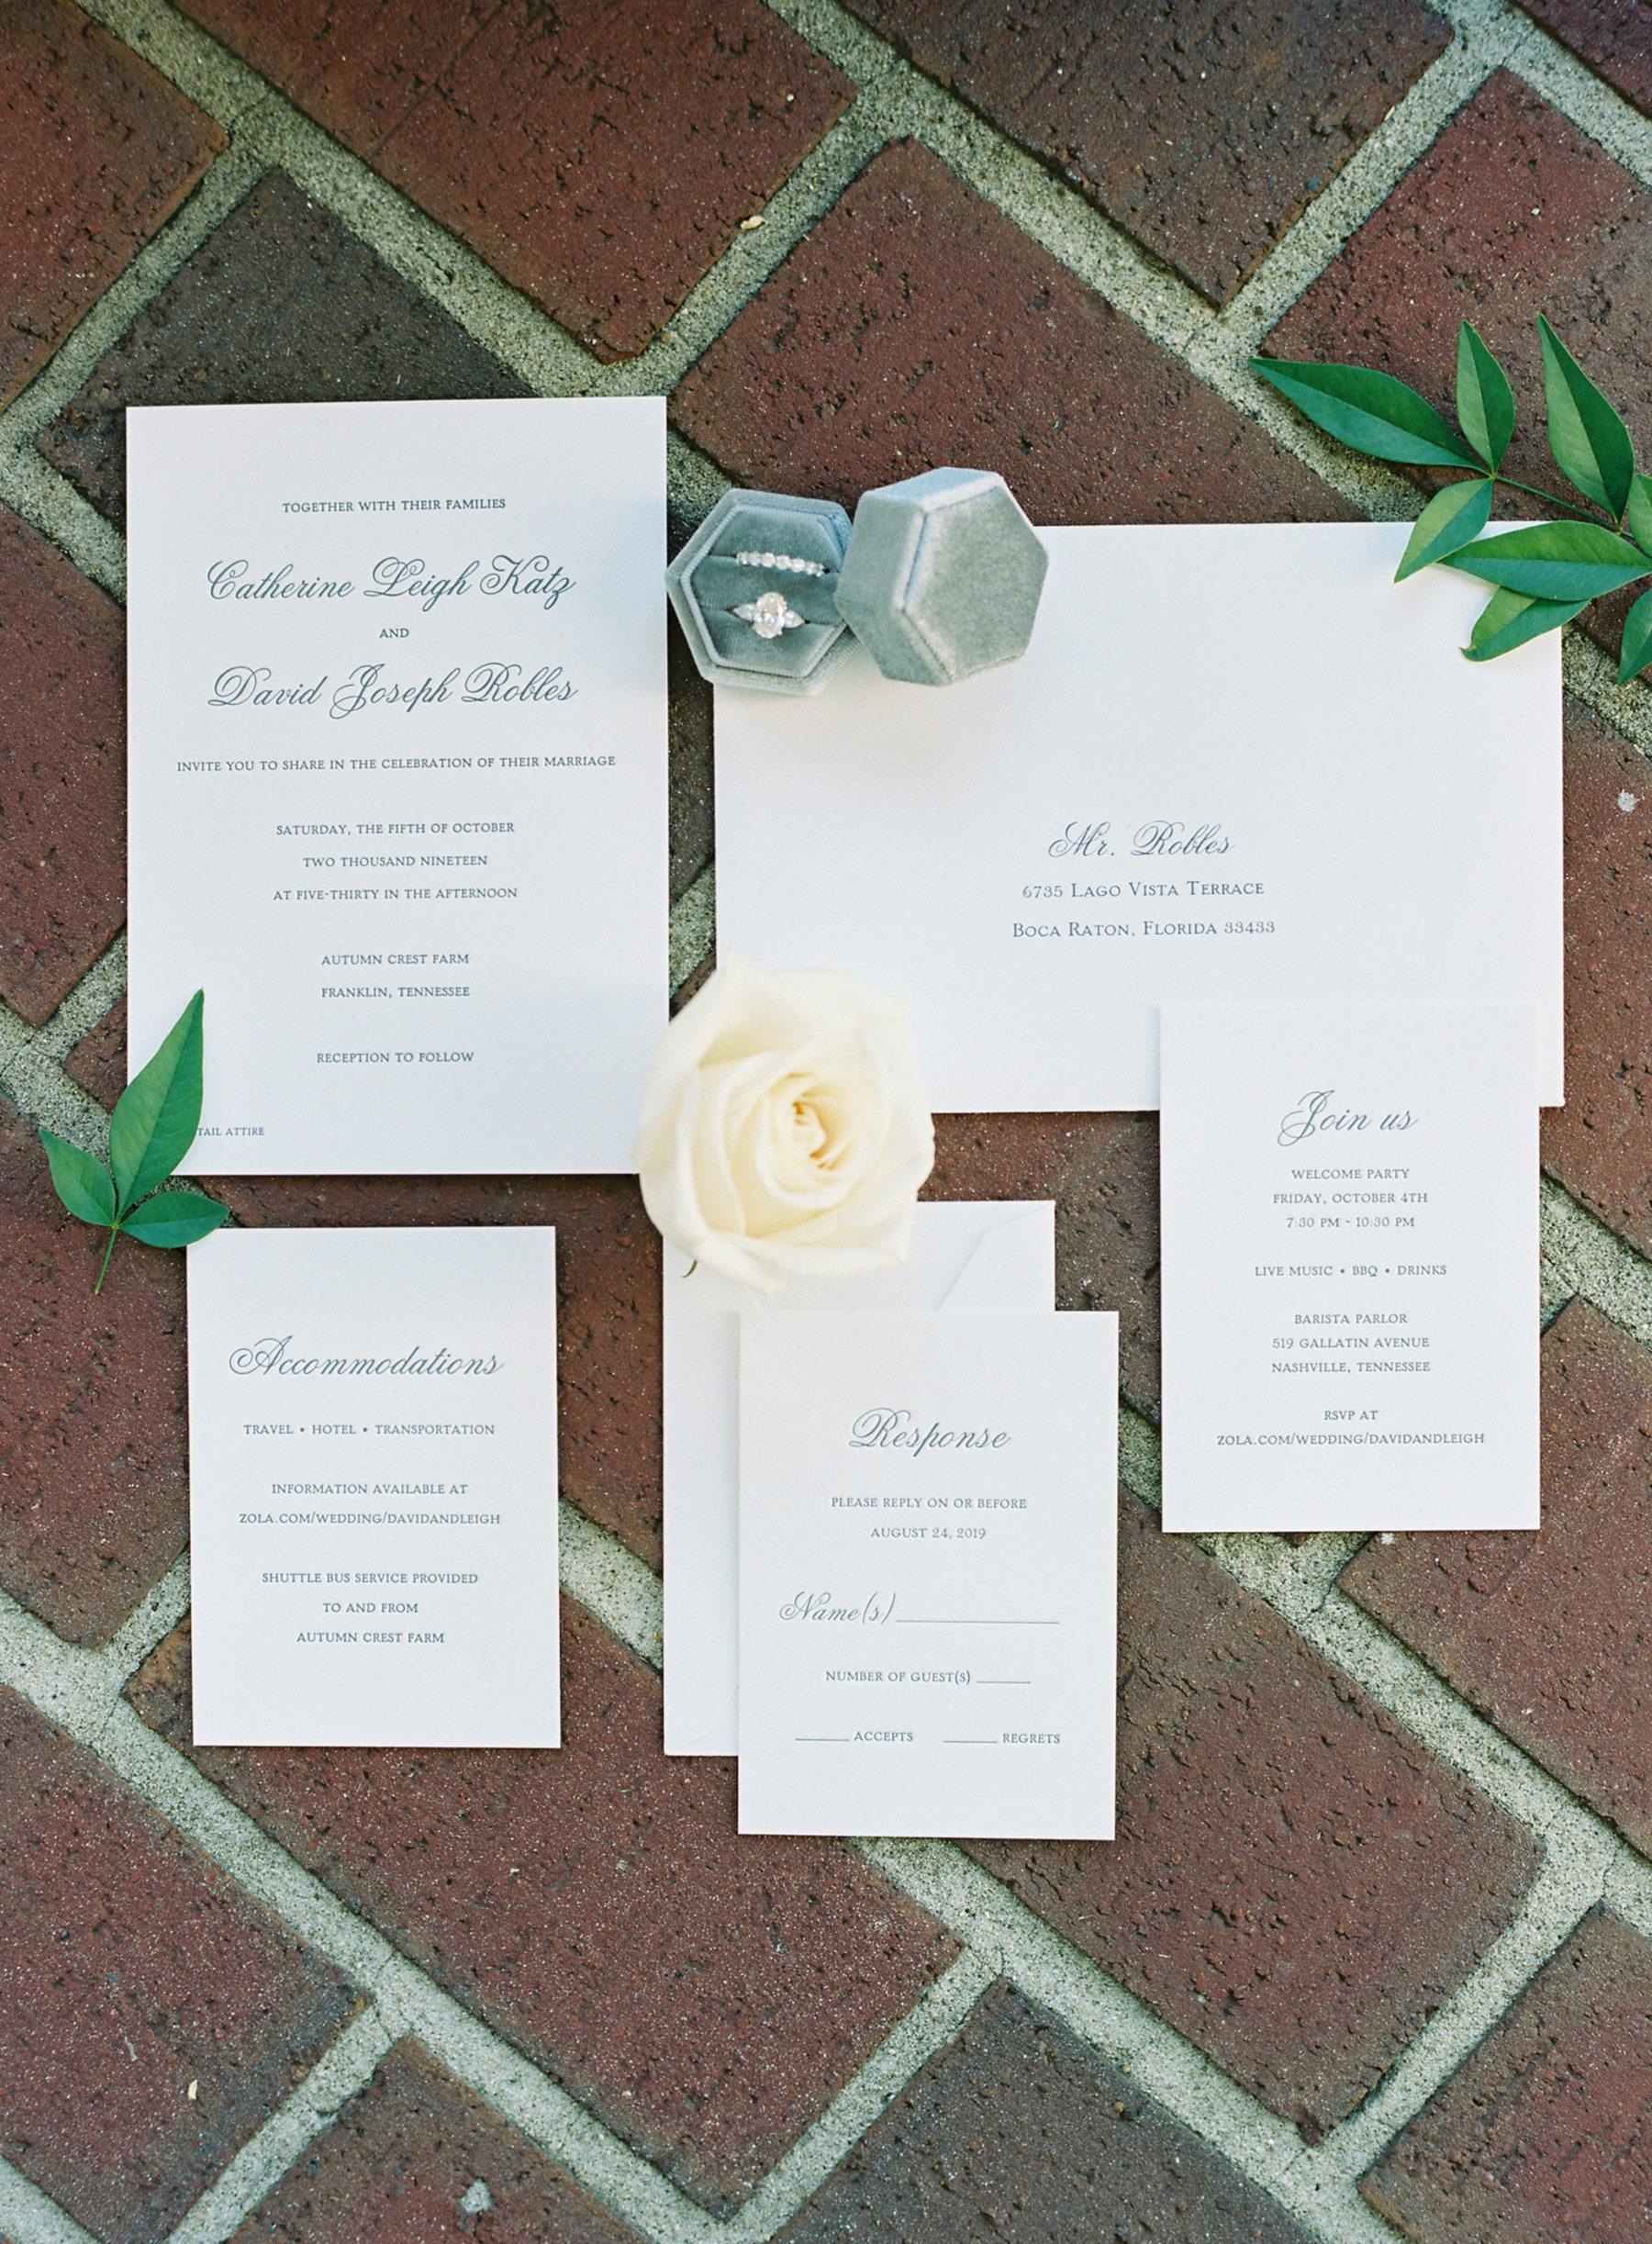 Minimalistic wedding invitation design